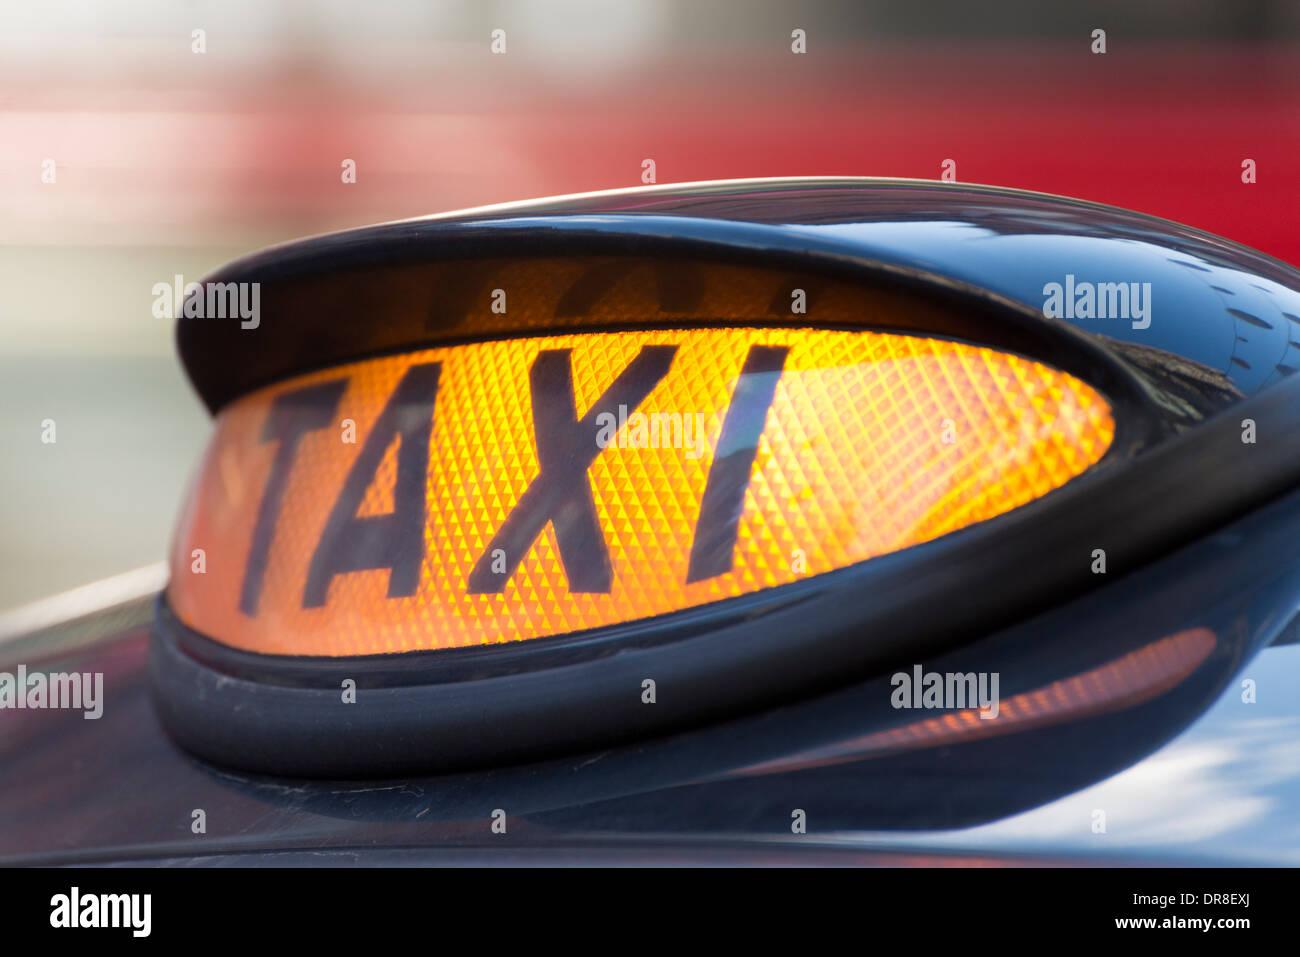 Encendido de luces de la cabina de taxis negros de Londres, Inglaterra, Reino Unido. Imagen De Stock